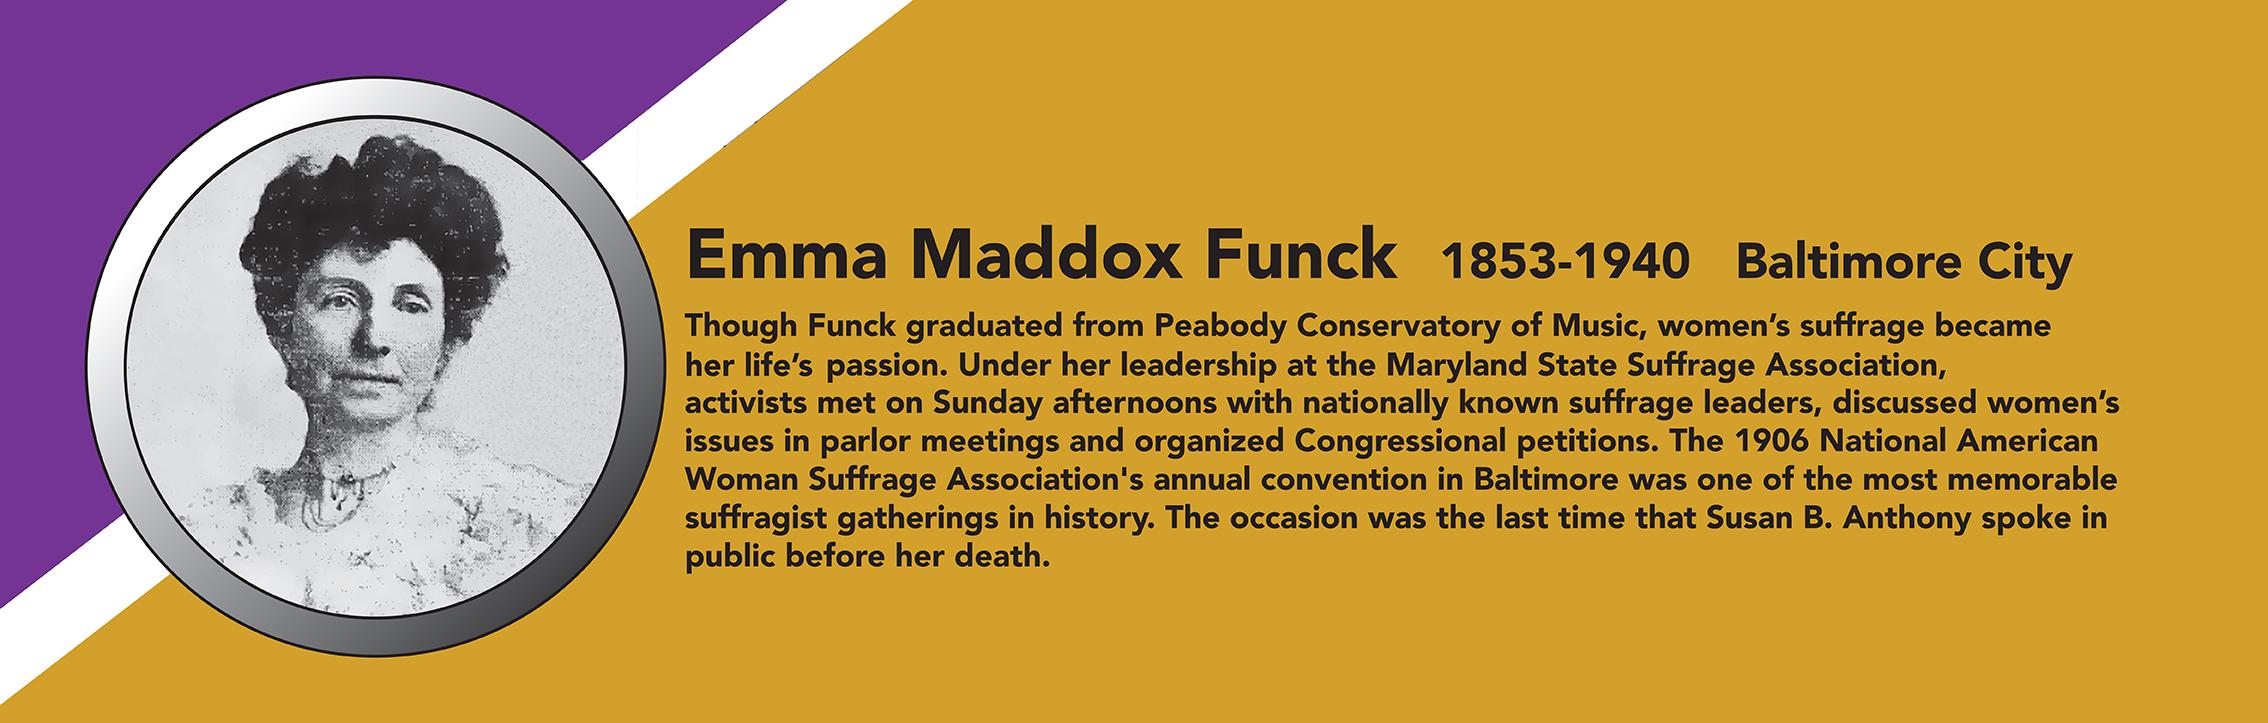 Emma Maddox Funck